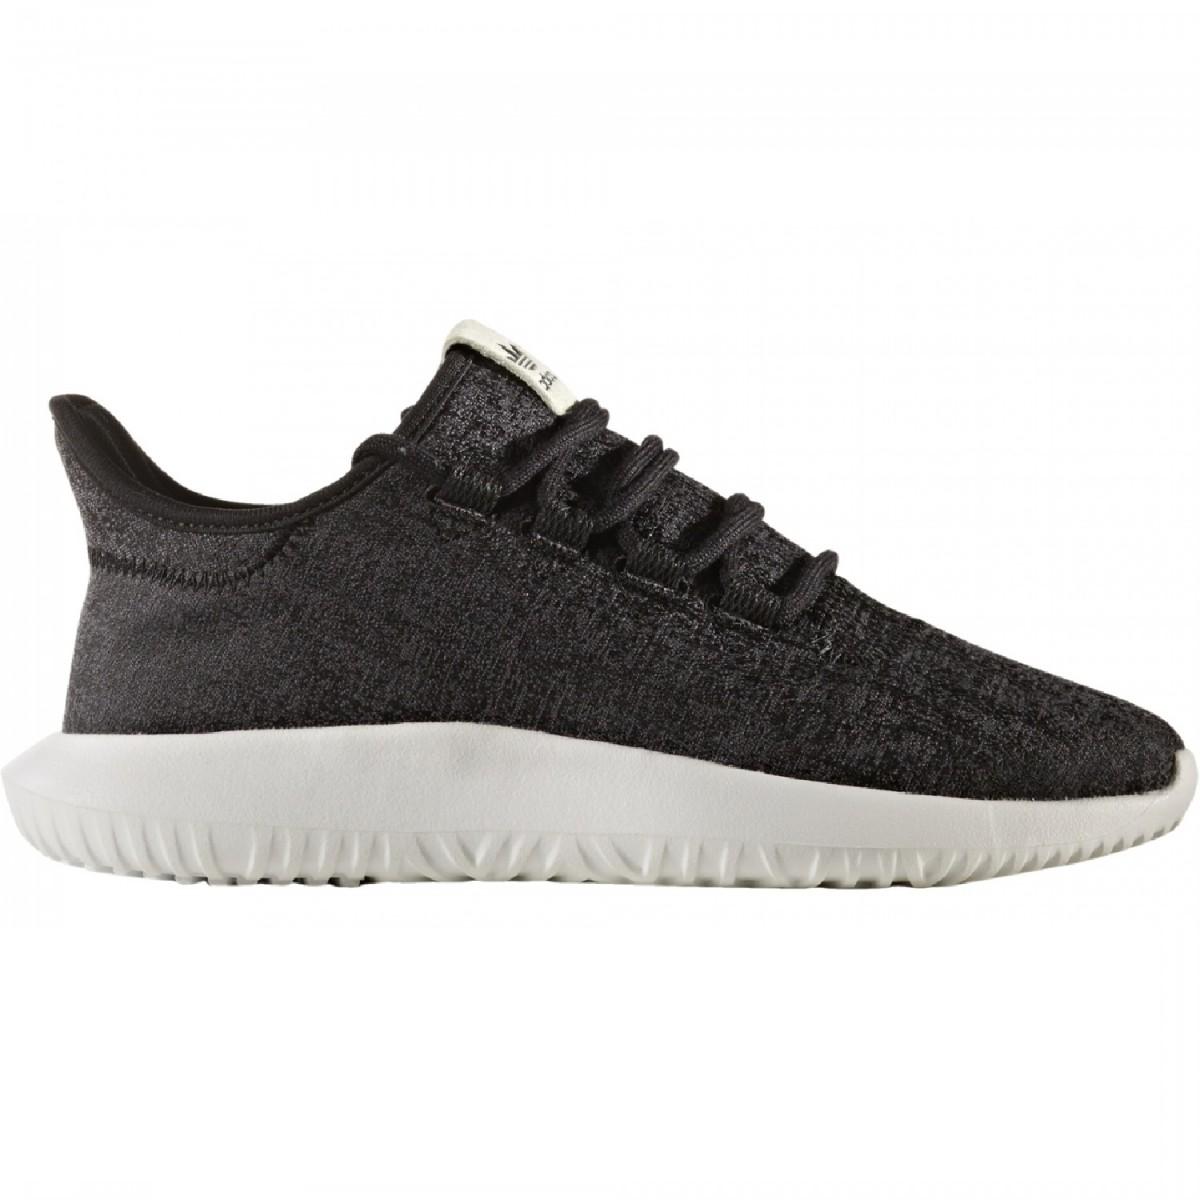 adidas Originals Tubular Shadow Sneaker Damen Schuhe  schwarz grau